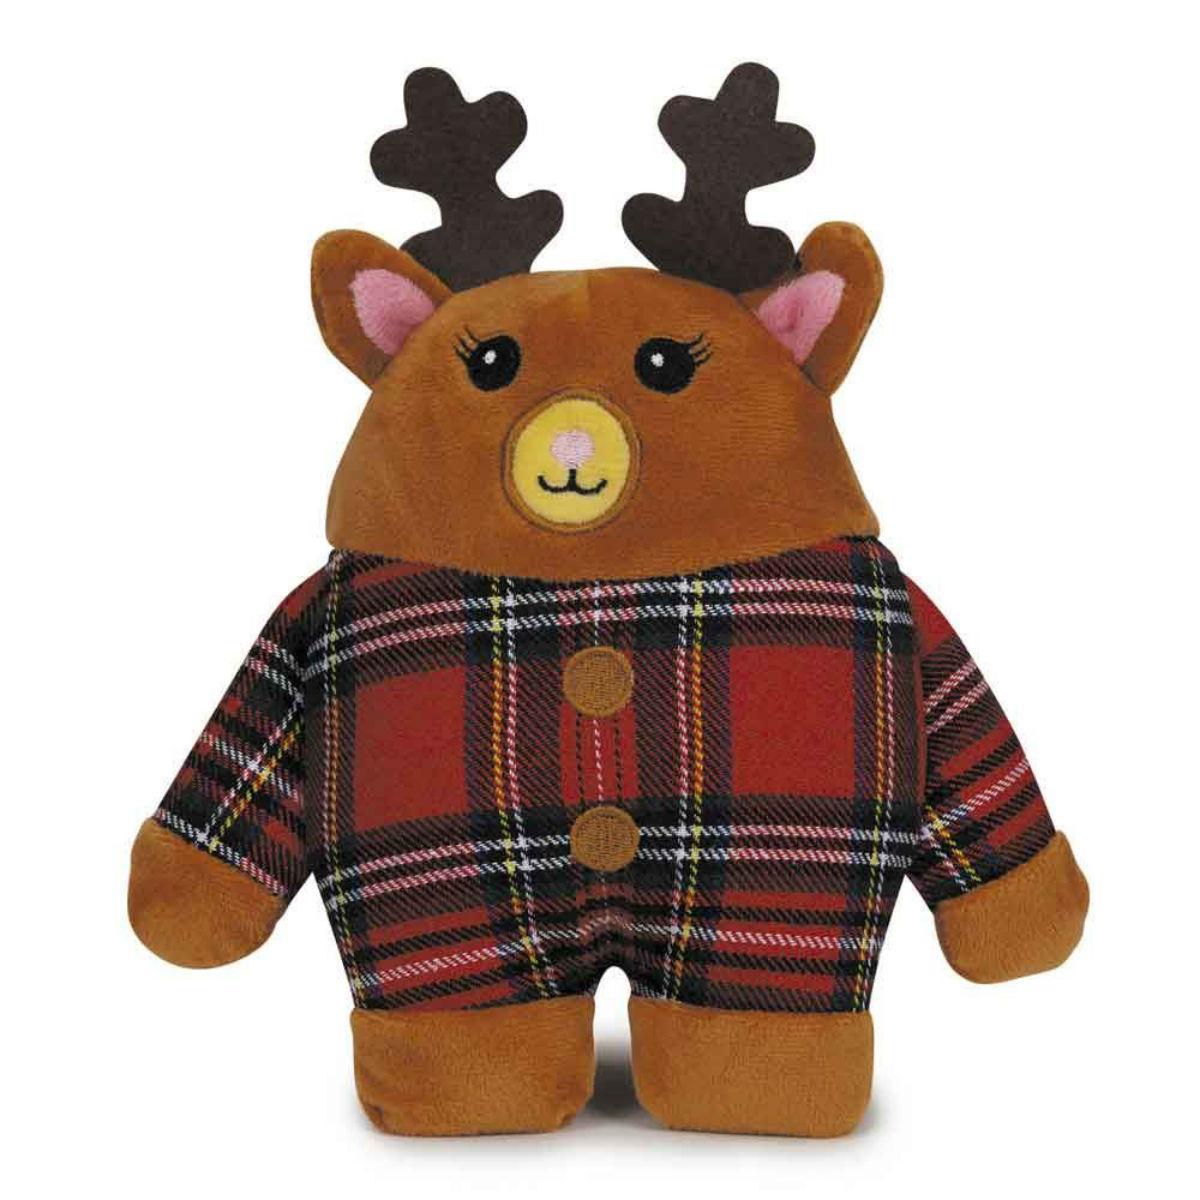 Zanies Holiday Tartan Friend Dog Toy - Reindeer